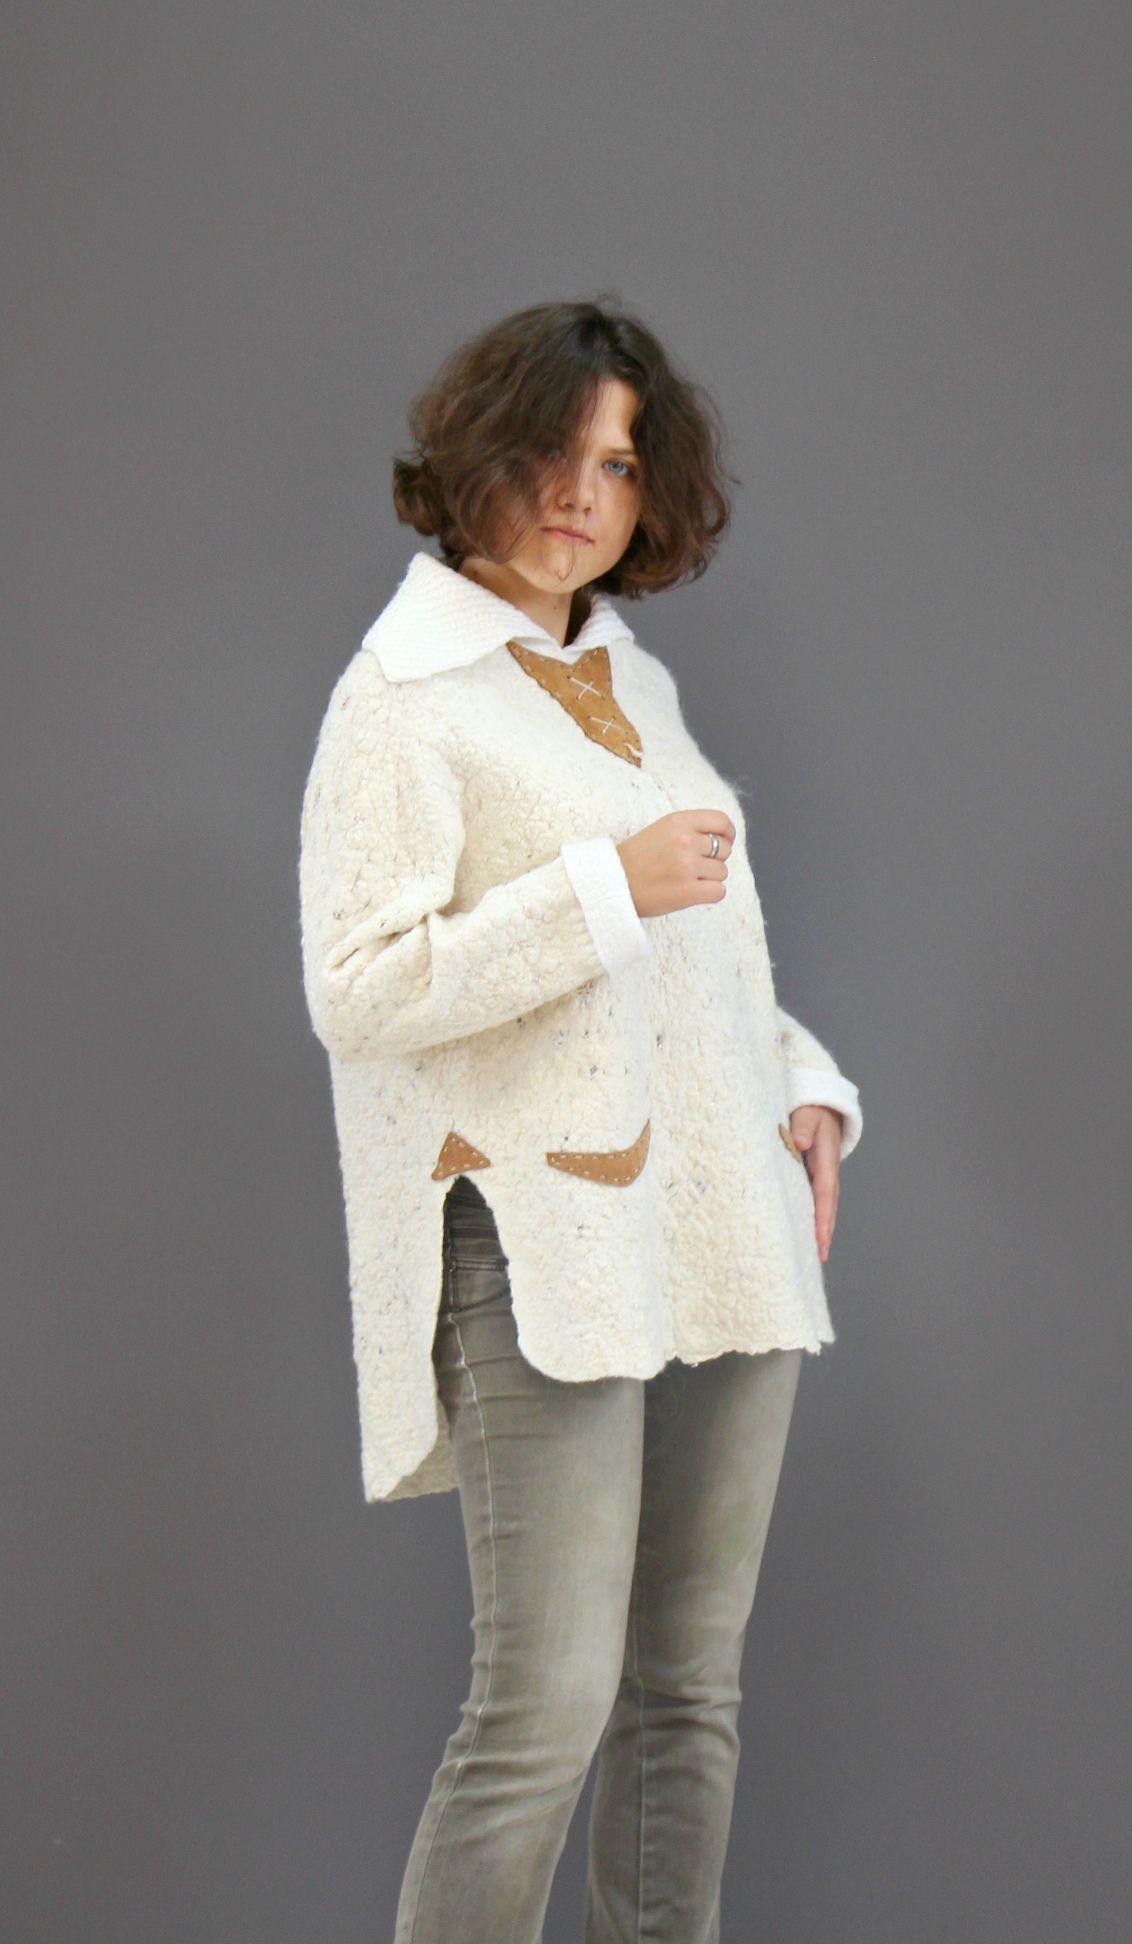 Kudelka / Jumper openwork merino wool